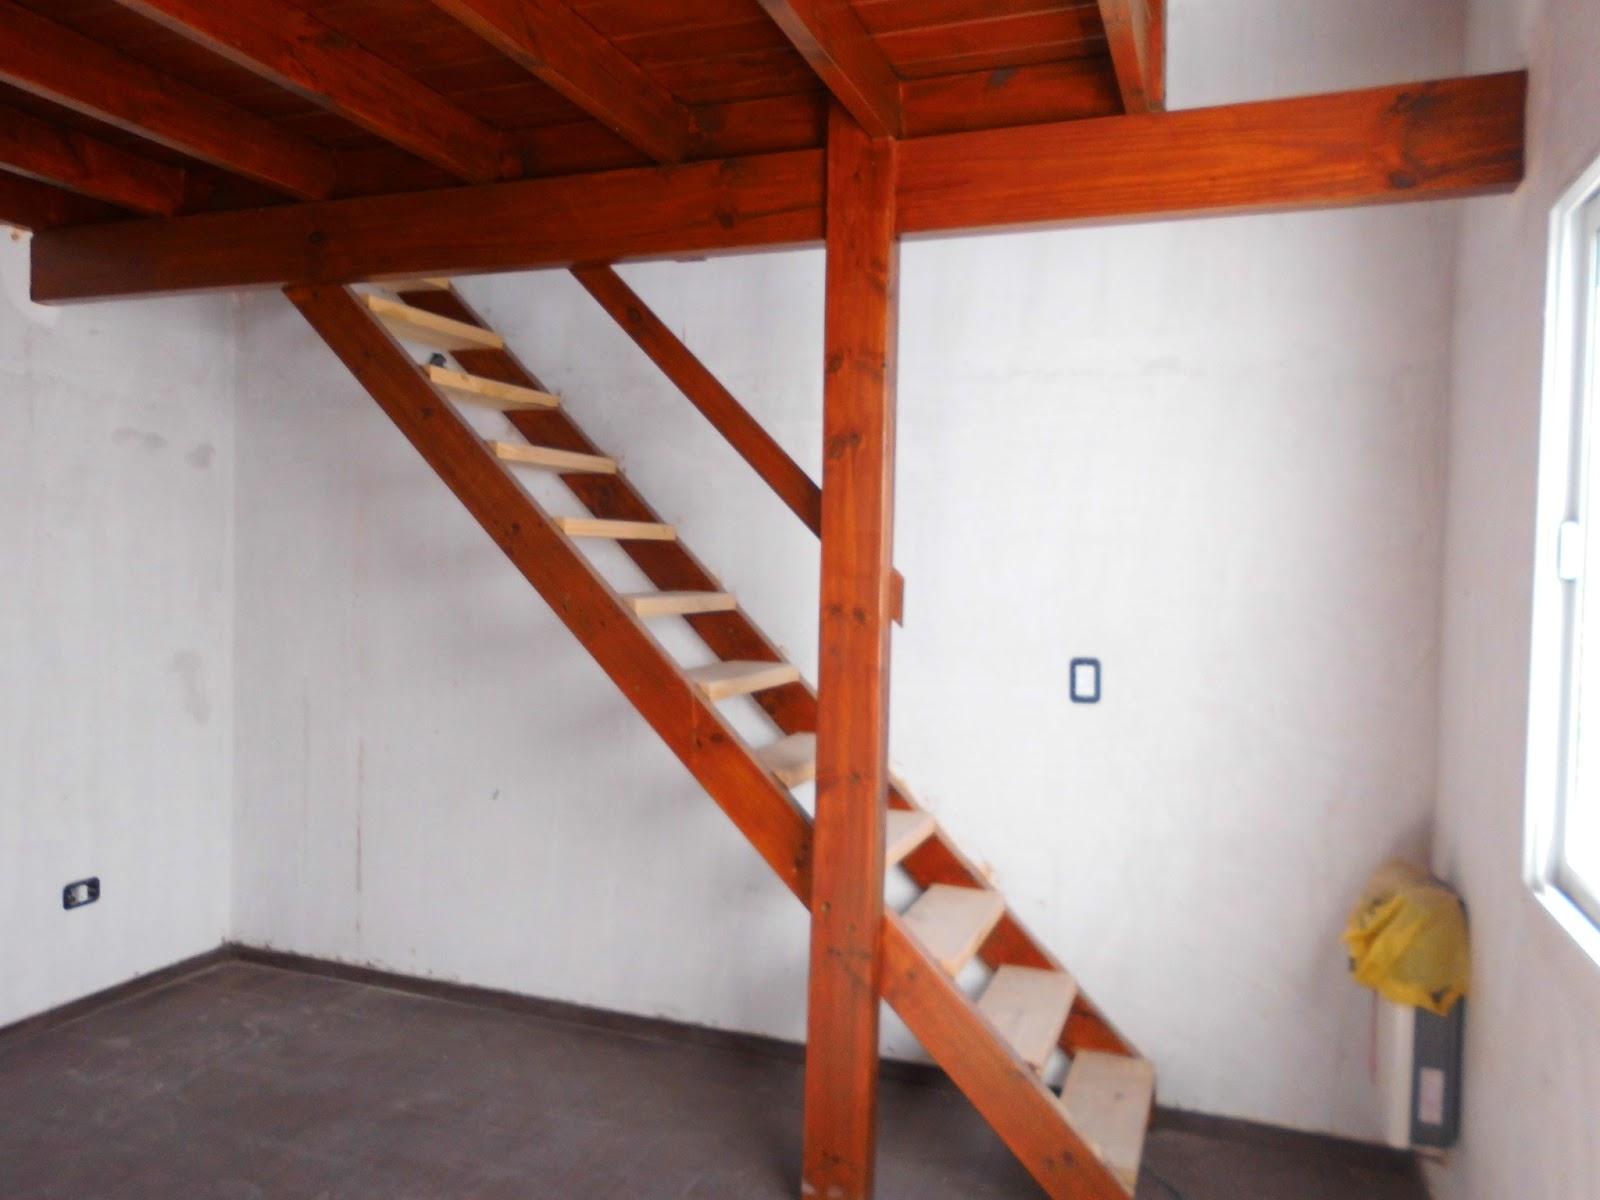 Entrepisos de madera escaleras for Escaleras de madera sencillas